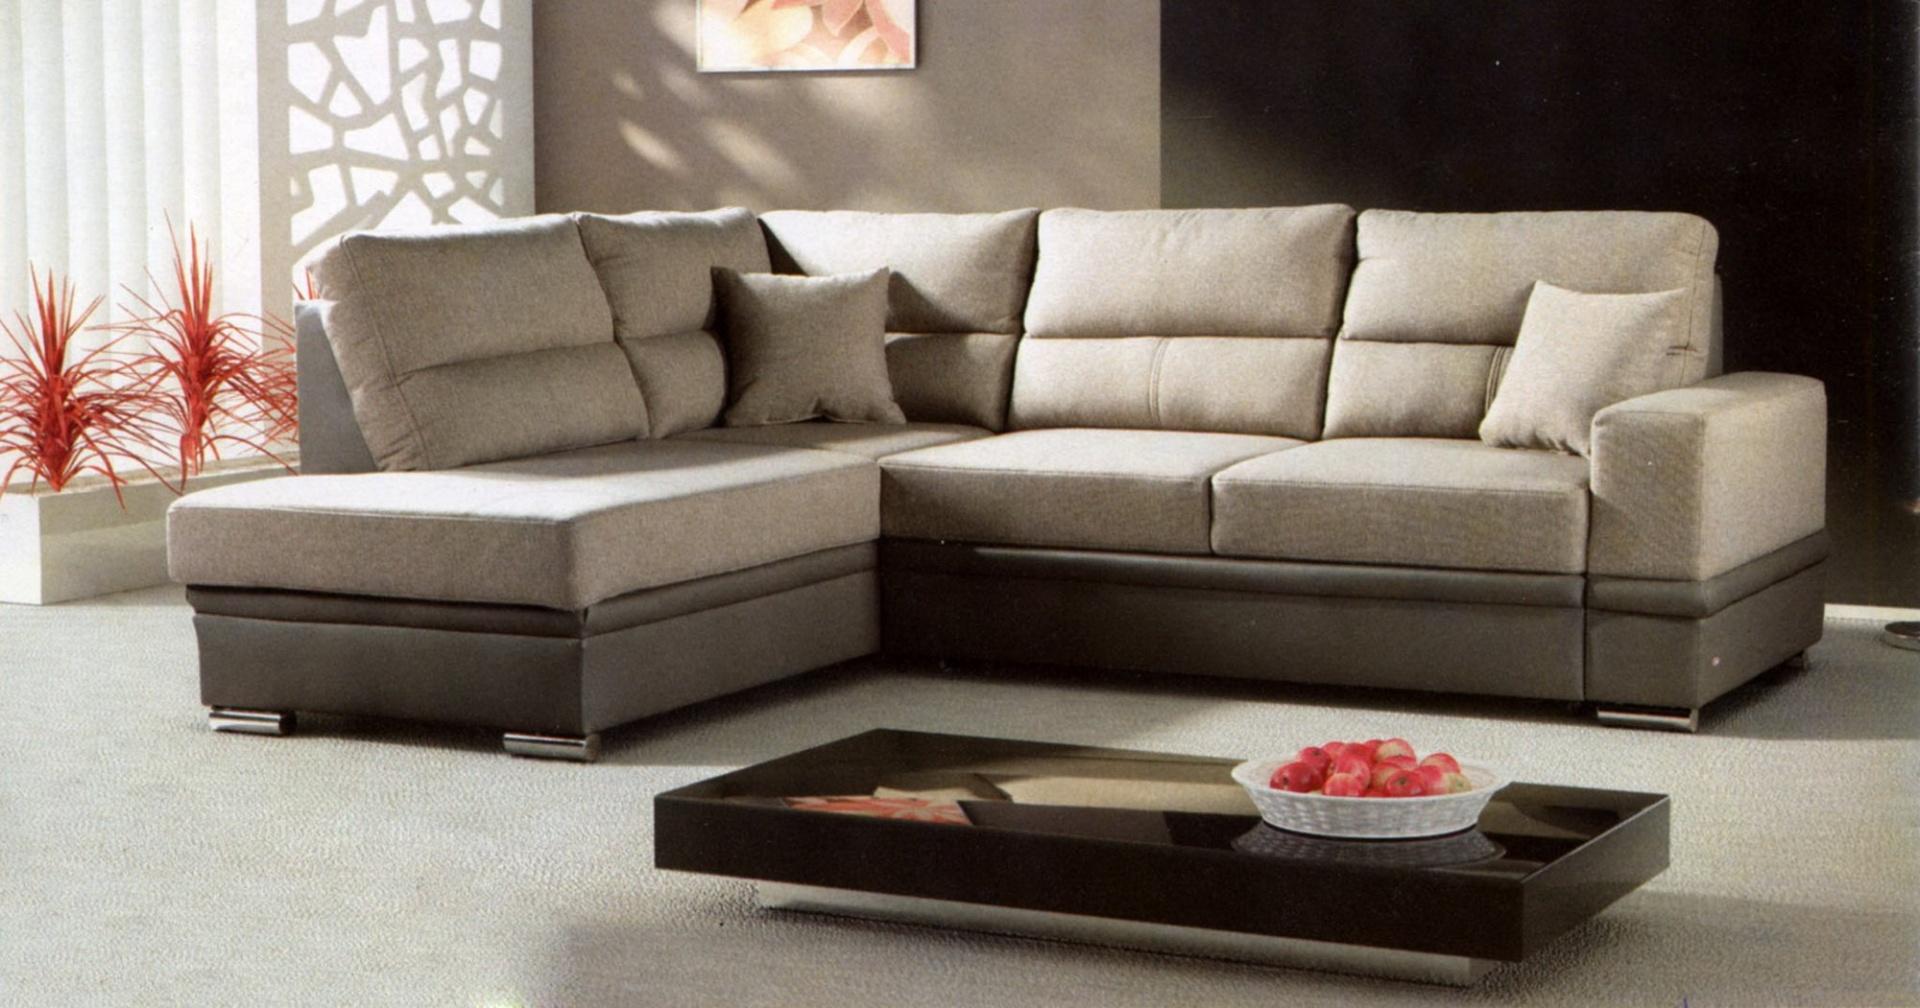 ASTUS  NEW диван с оттоманкой Astus